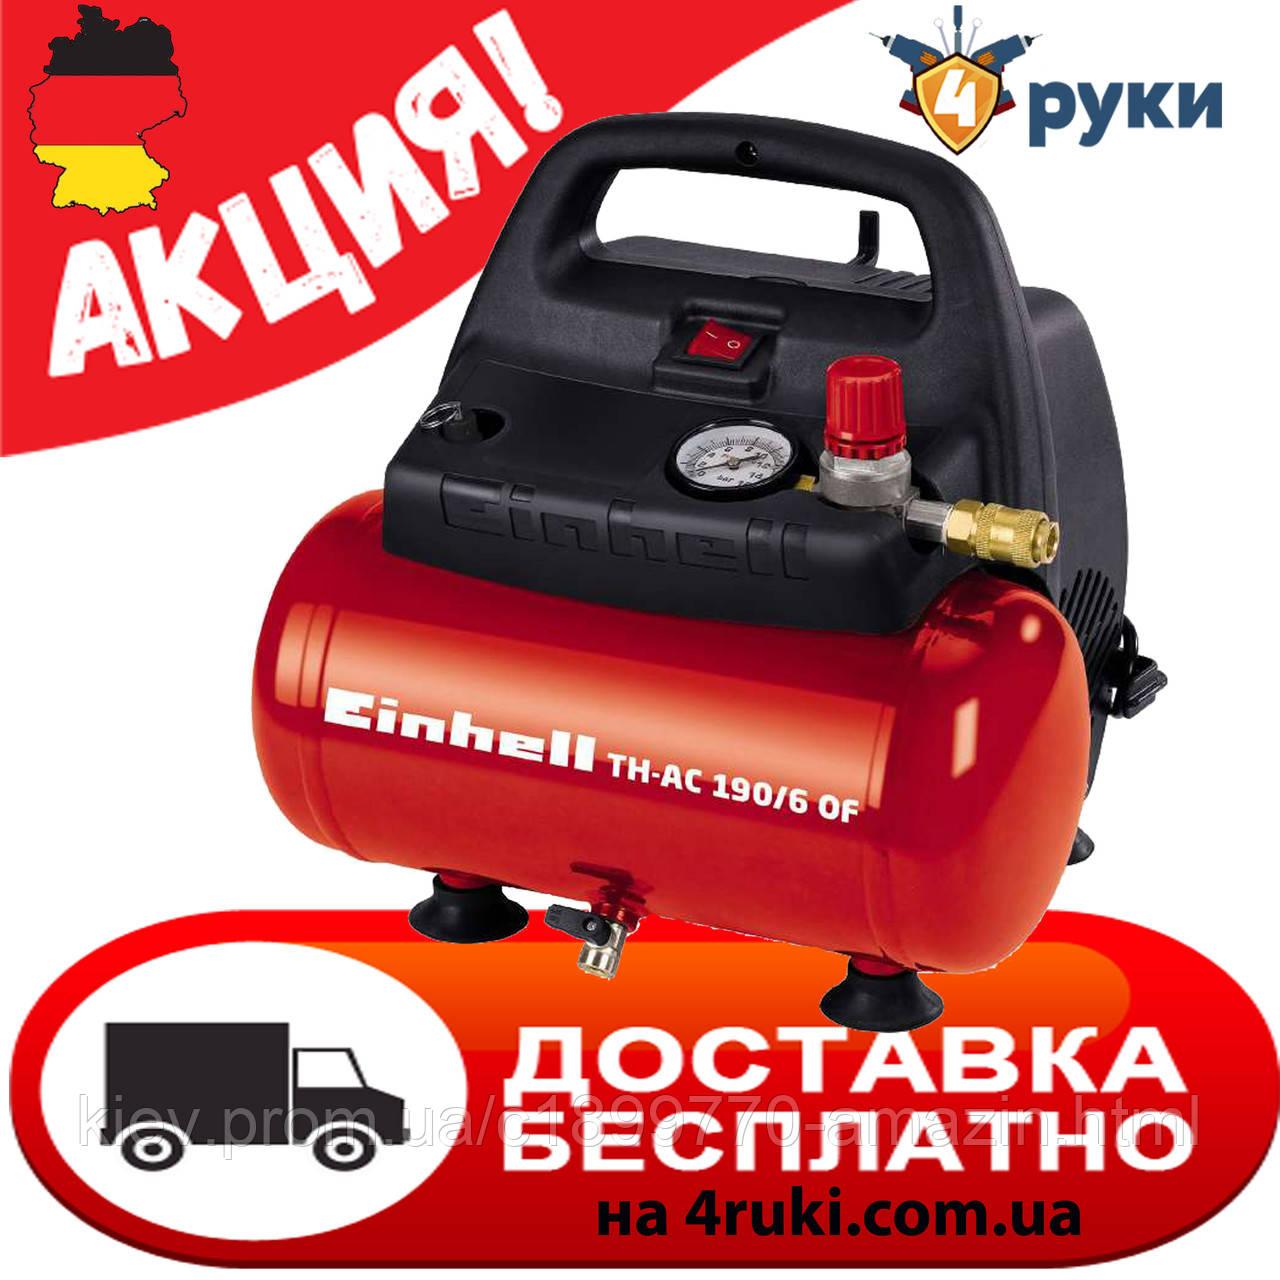 Компрессор Einhell TH-AC 190/6 OF New